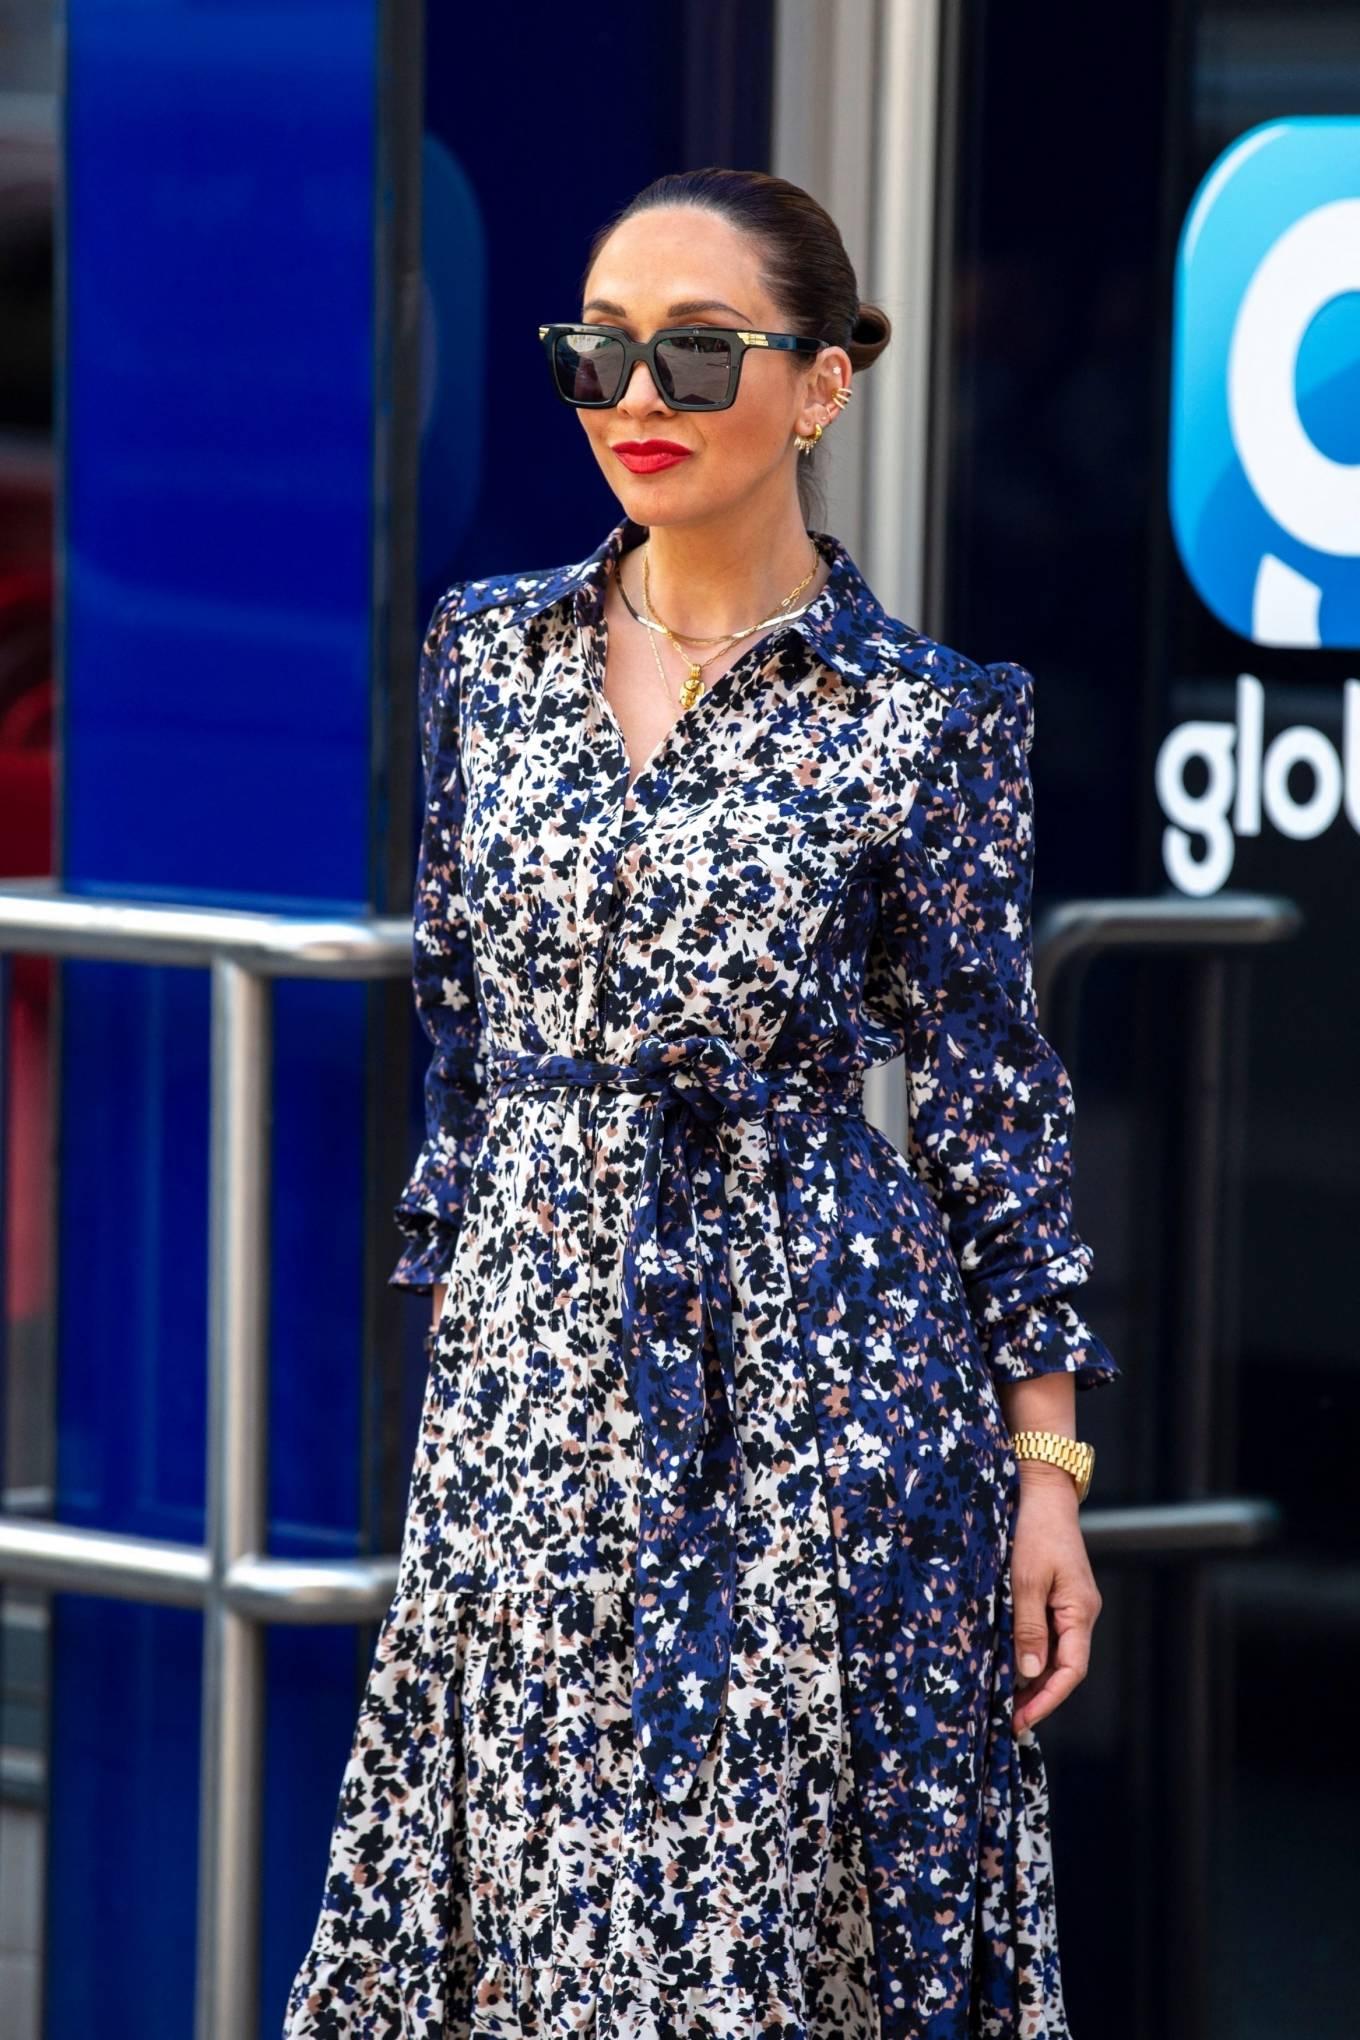 Myleene Klass 2021 : Myleene Klass – In a long summer dress arriving at the Global studios -13